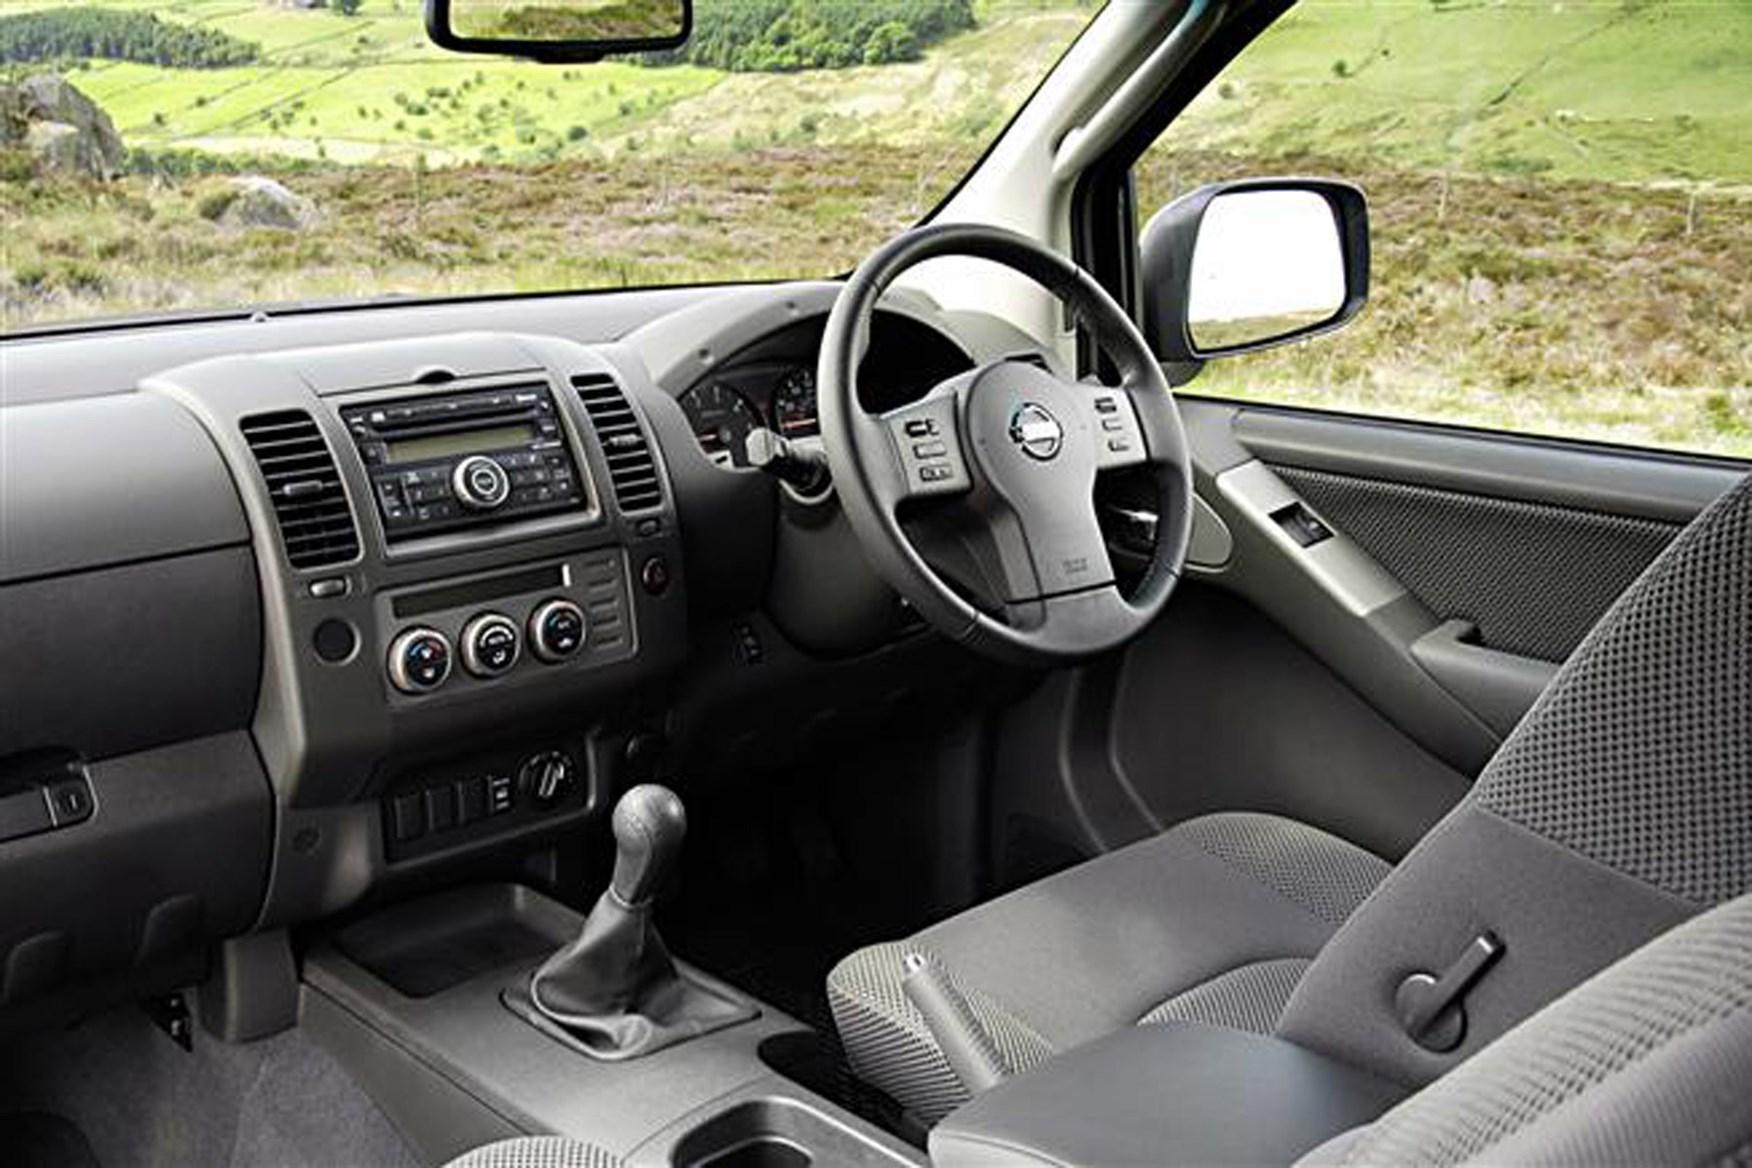 Nissan Navara 2005-2015 review on Parkers Vans - interior